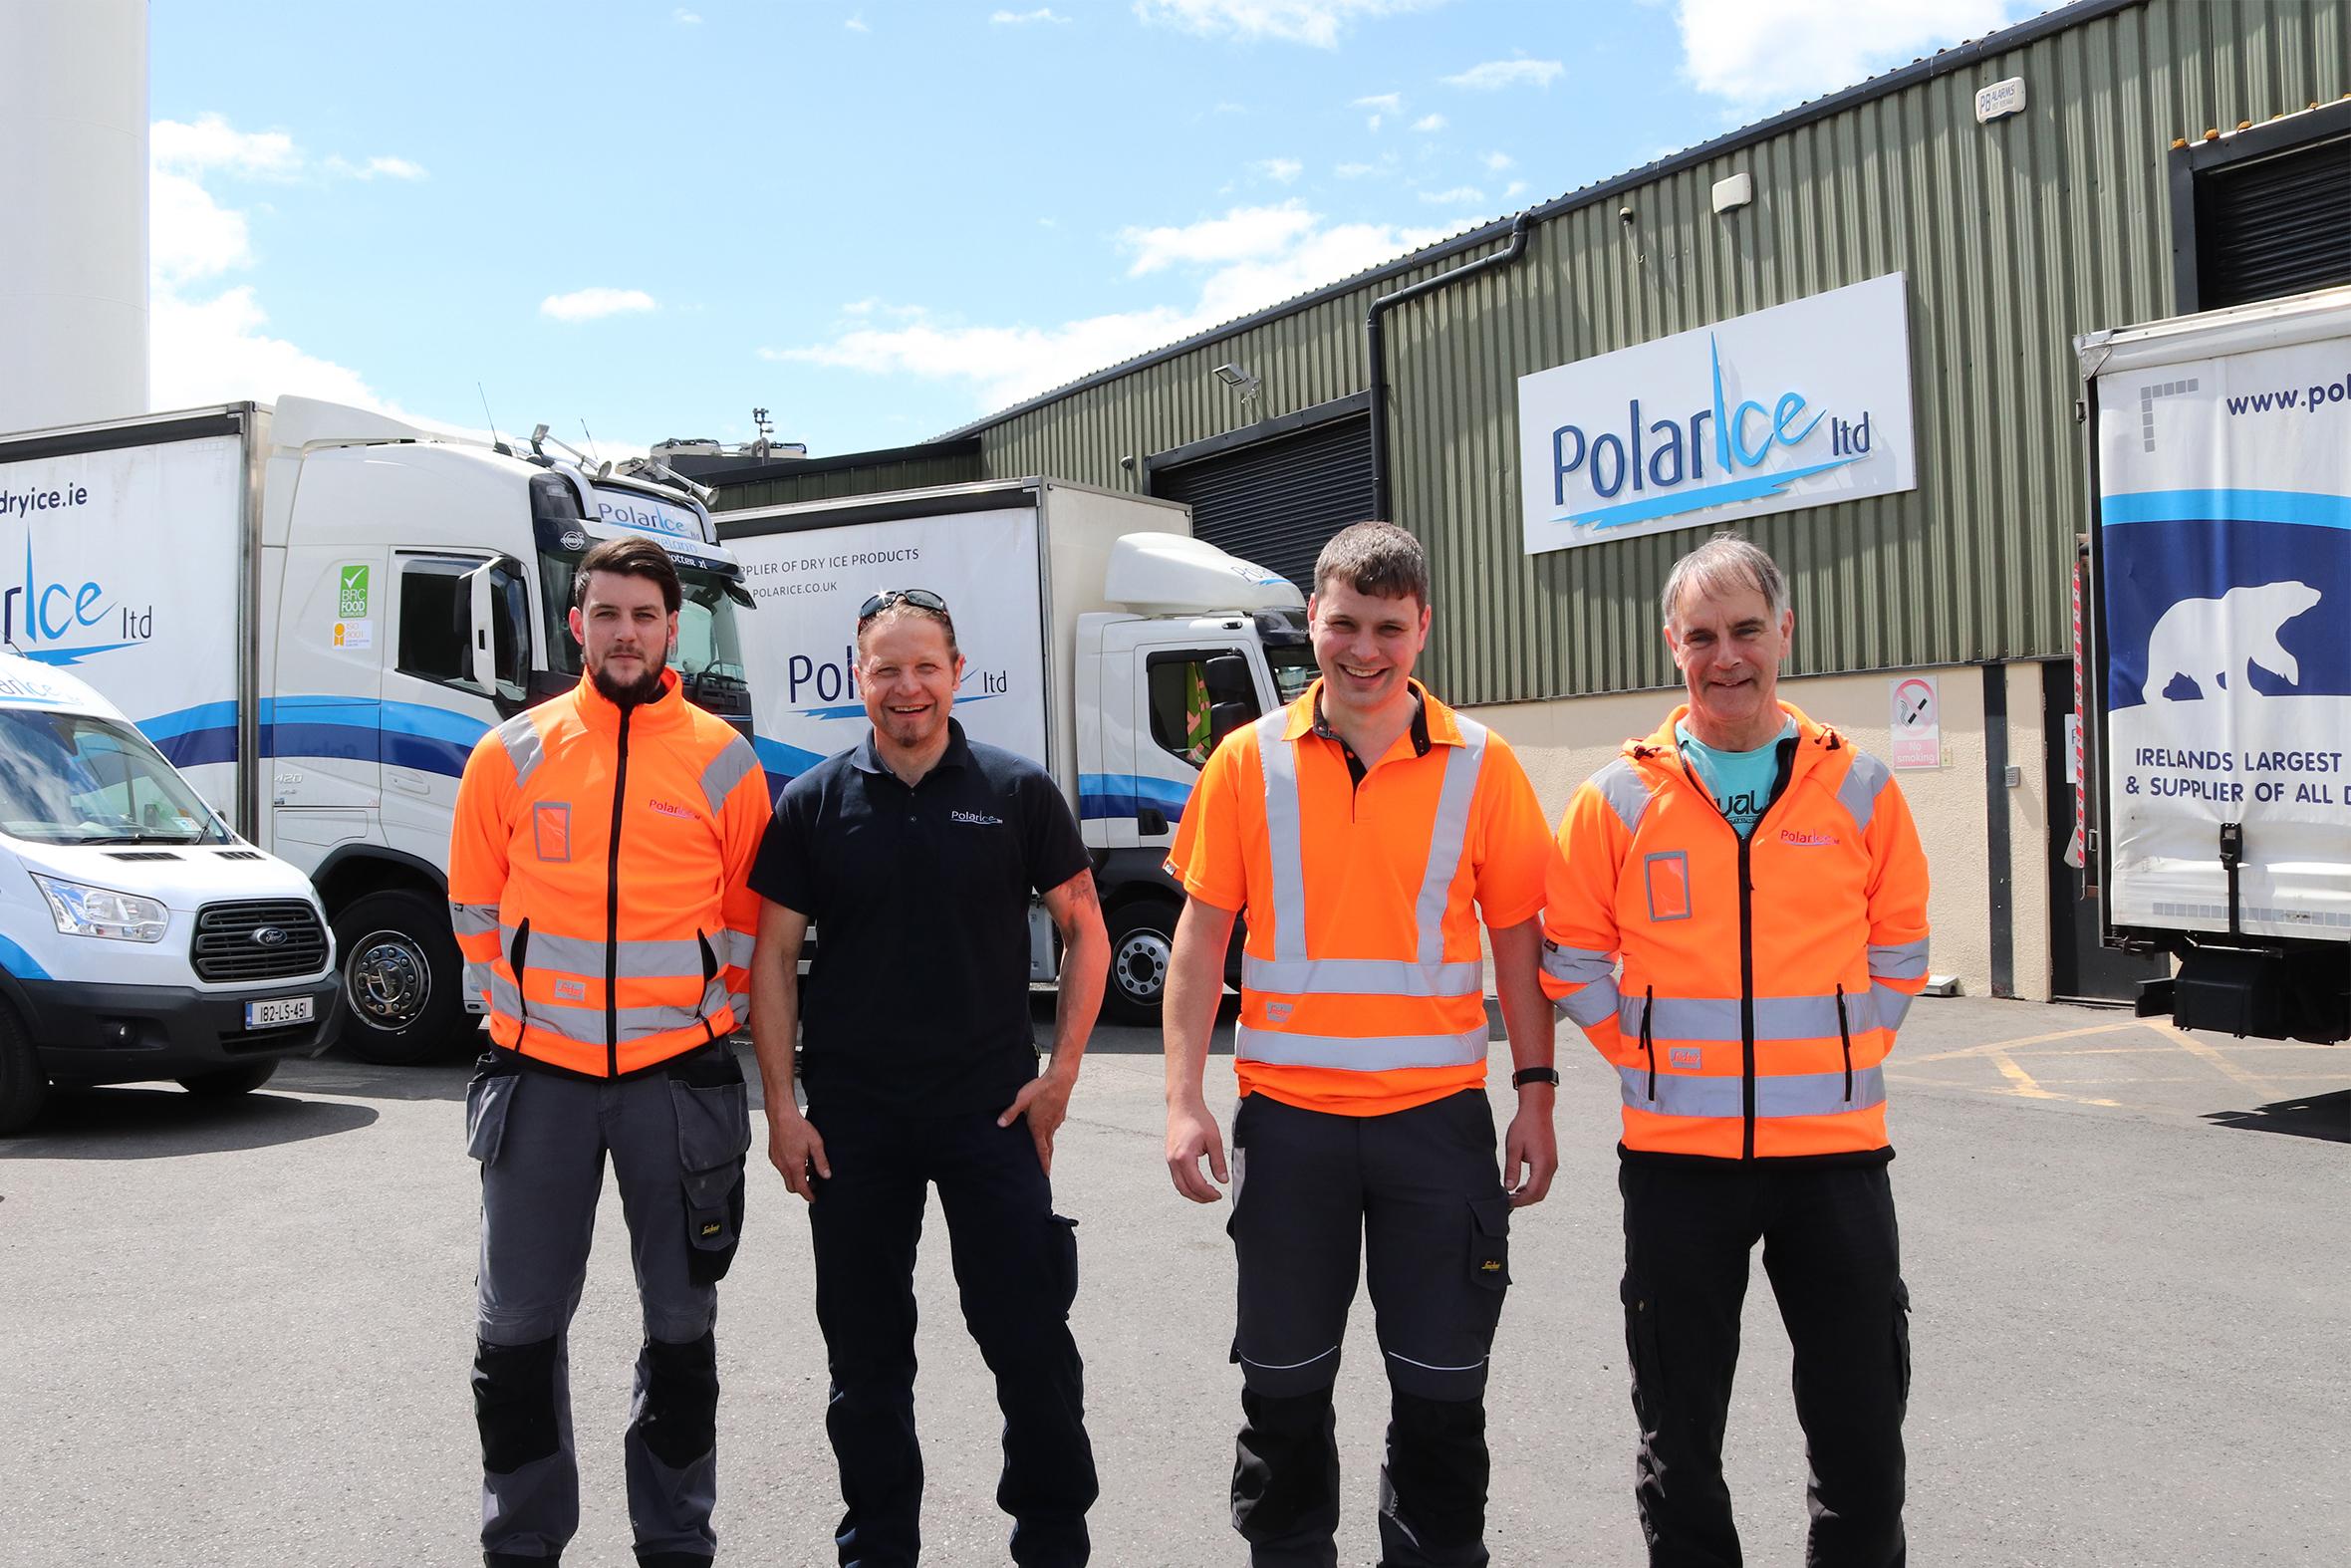 Polar Ice Team of Drivers